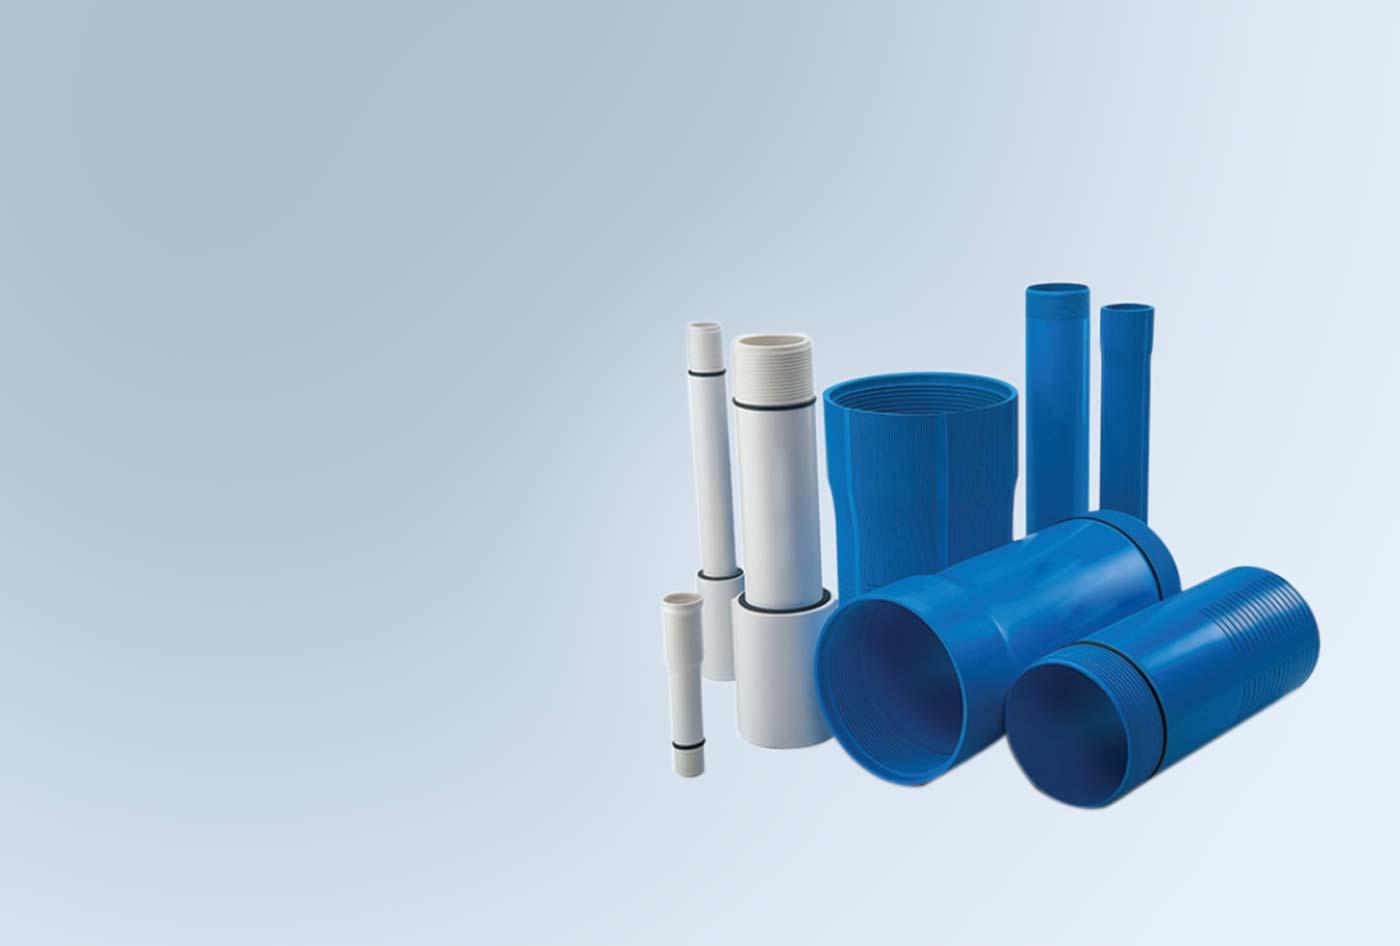 World's No. 1 PVC Plumbing Systems